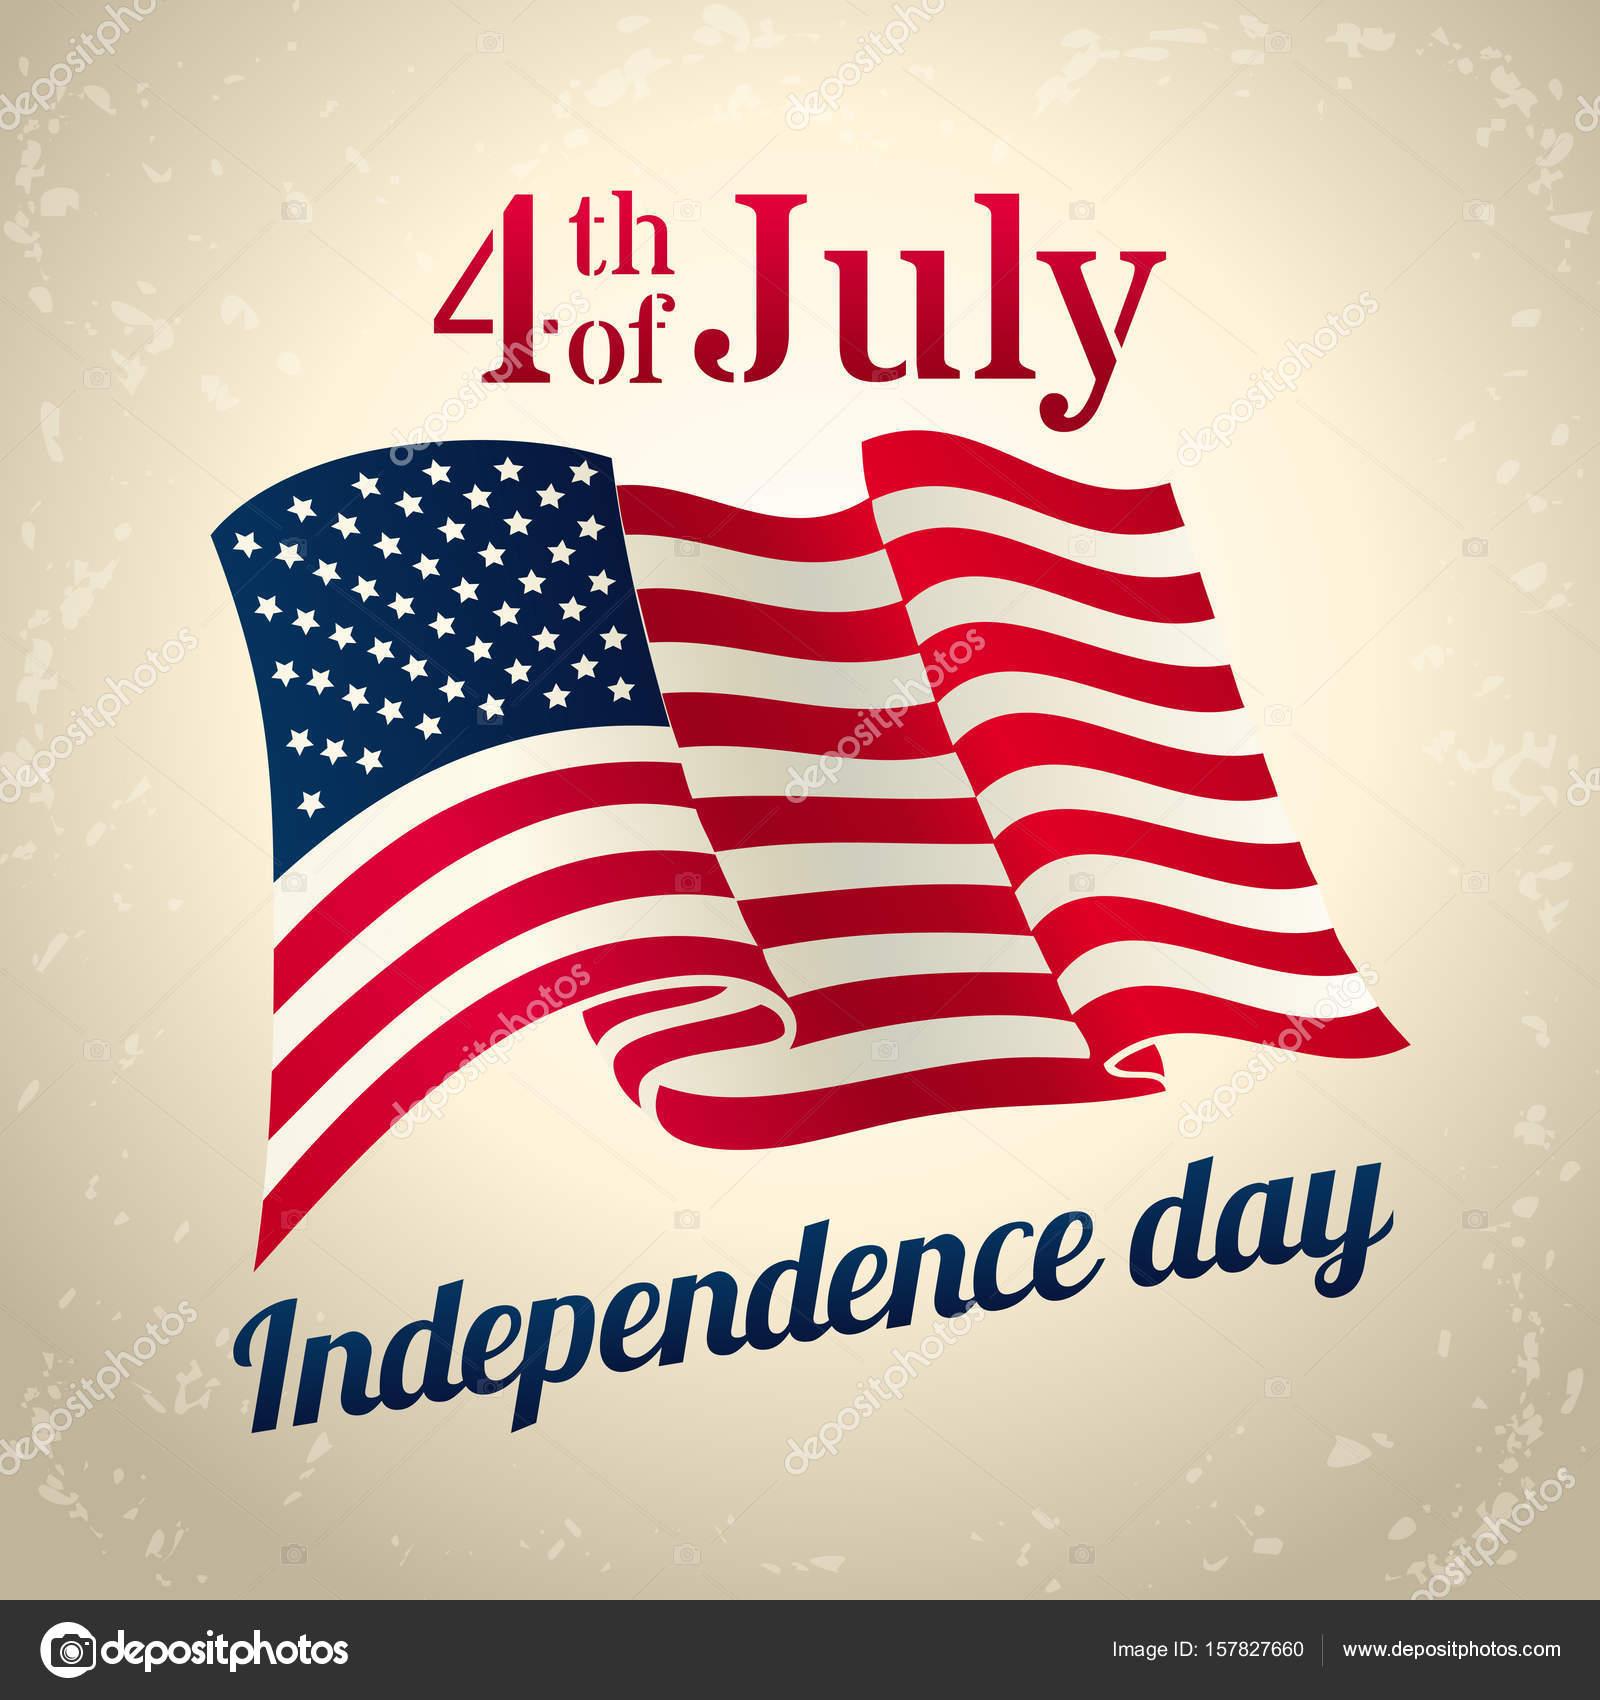 5e9af54658d3f6 Vintage style american Independence Day design - banner or poster for web